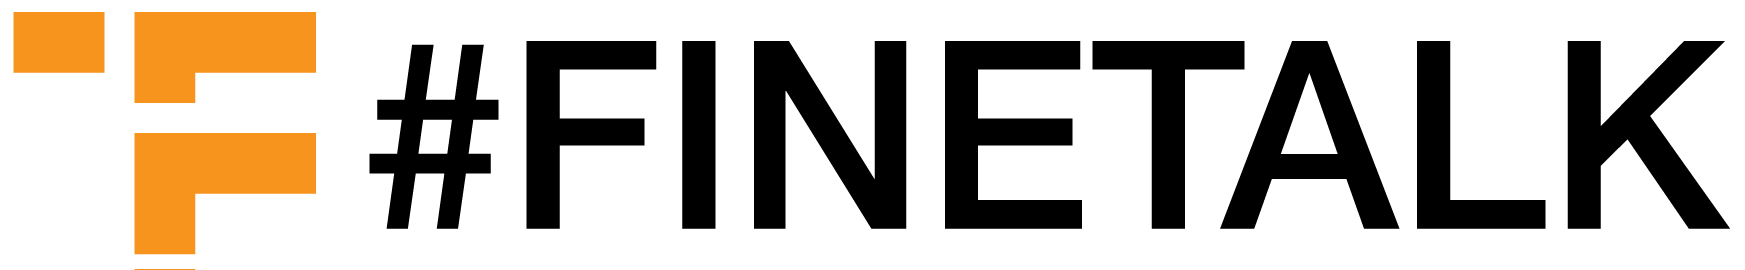 FINETALK-LOGO2